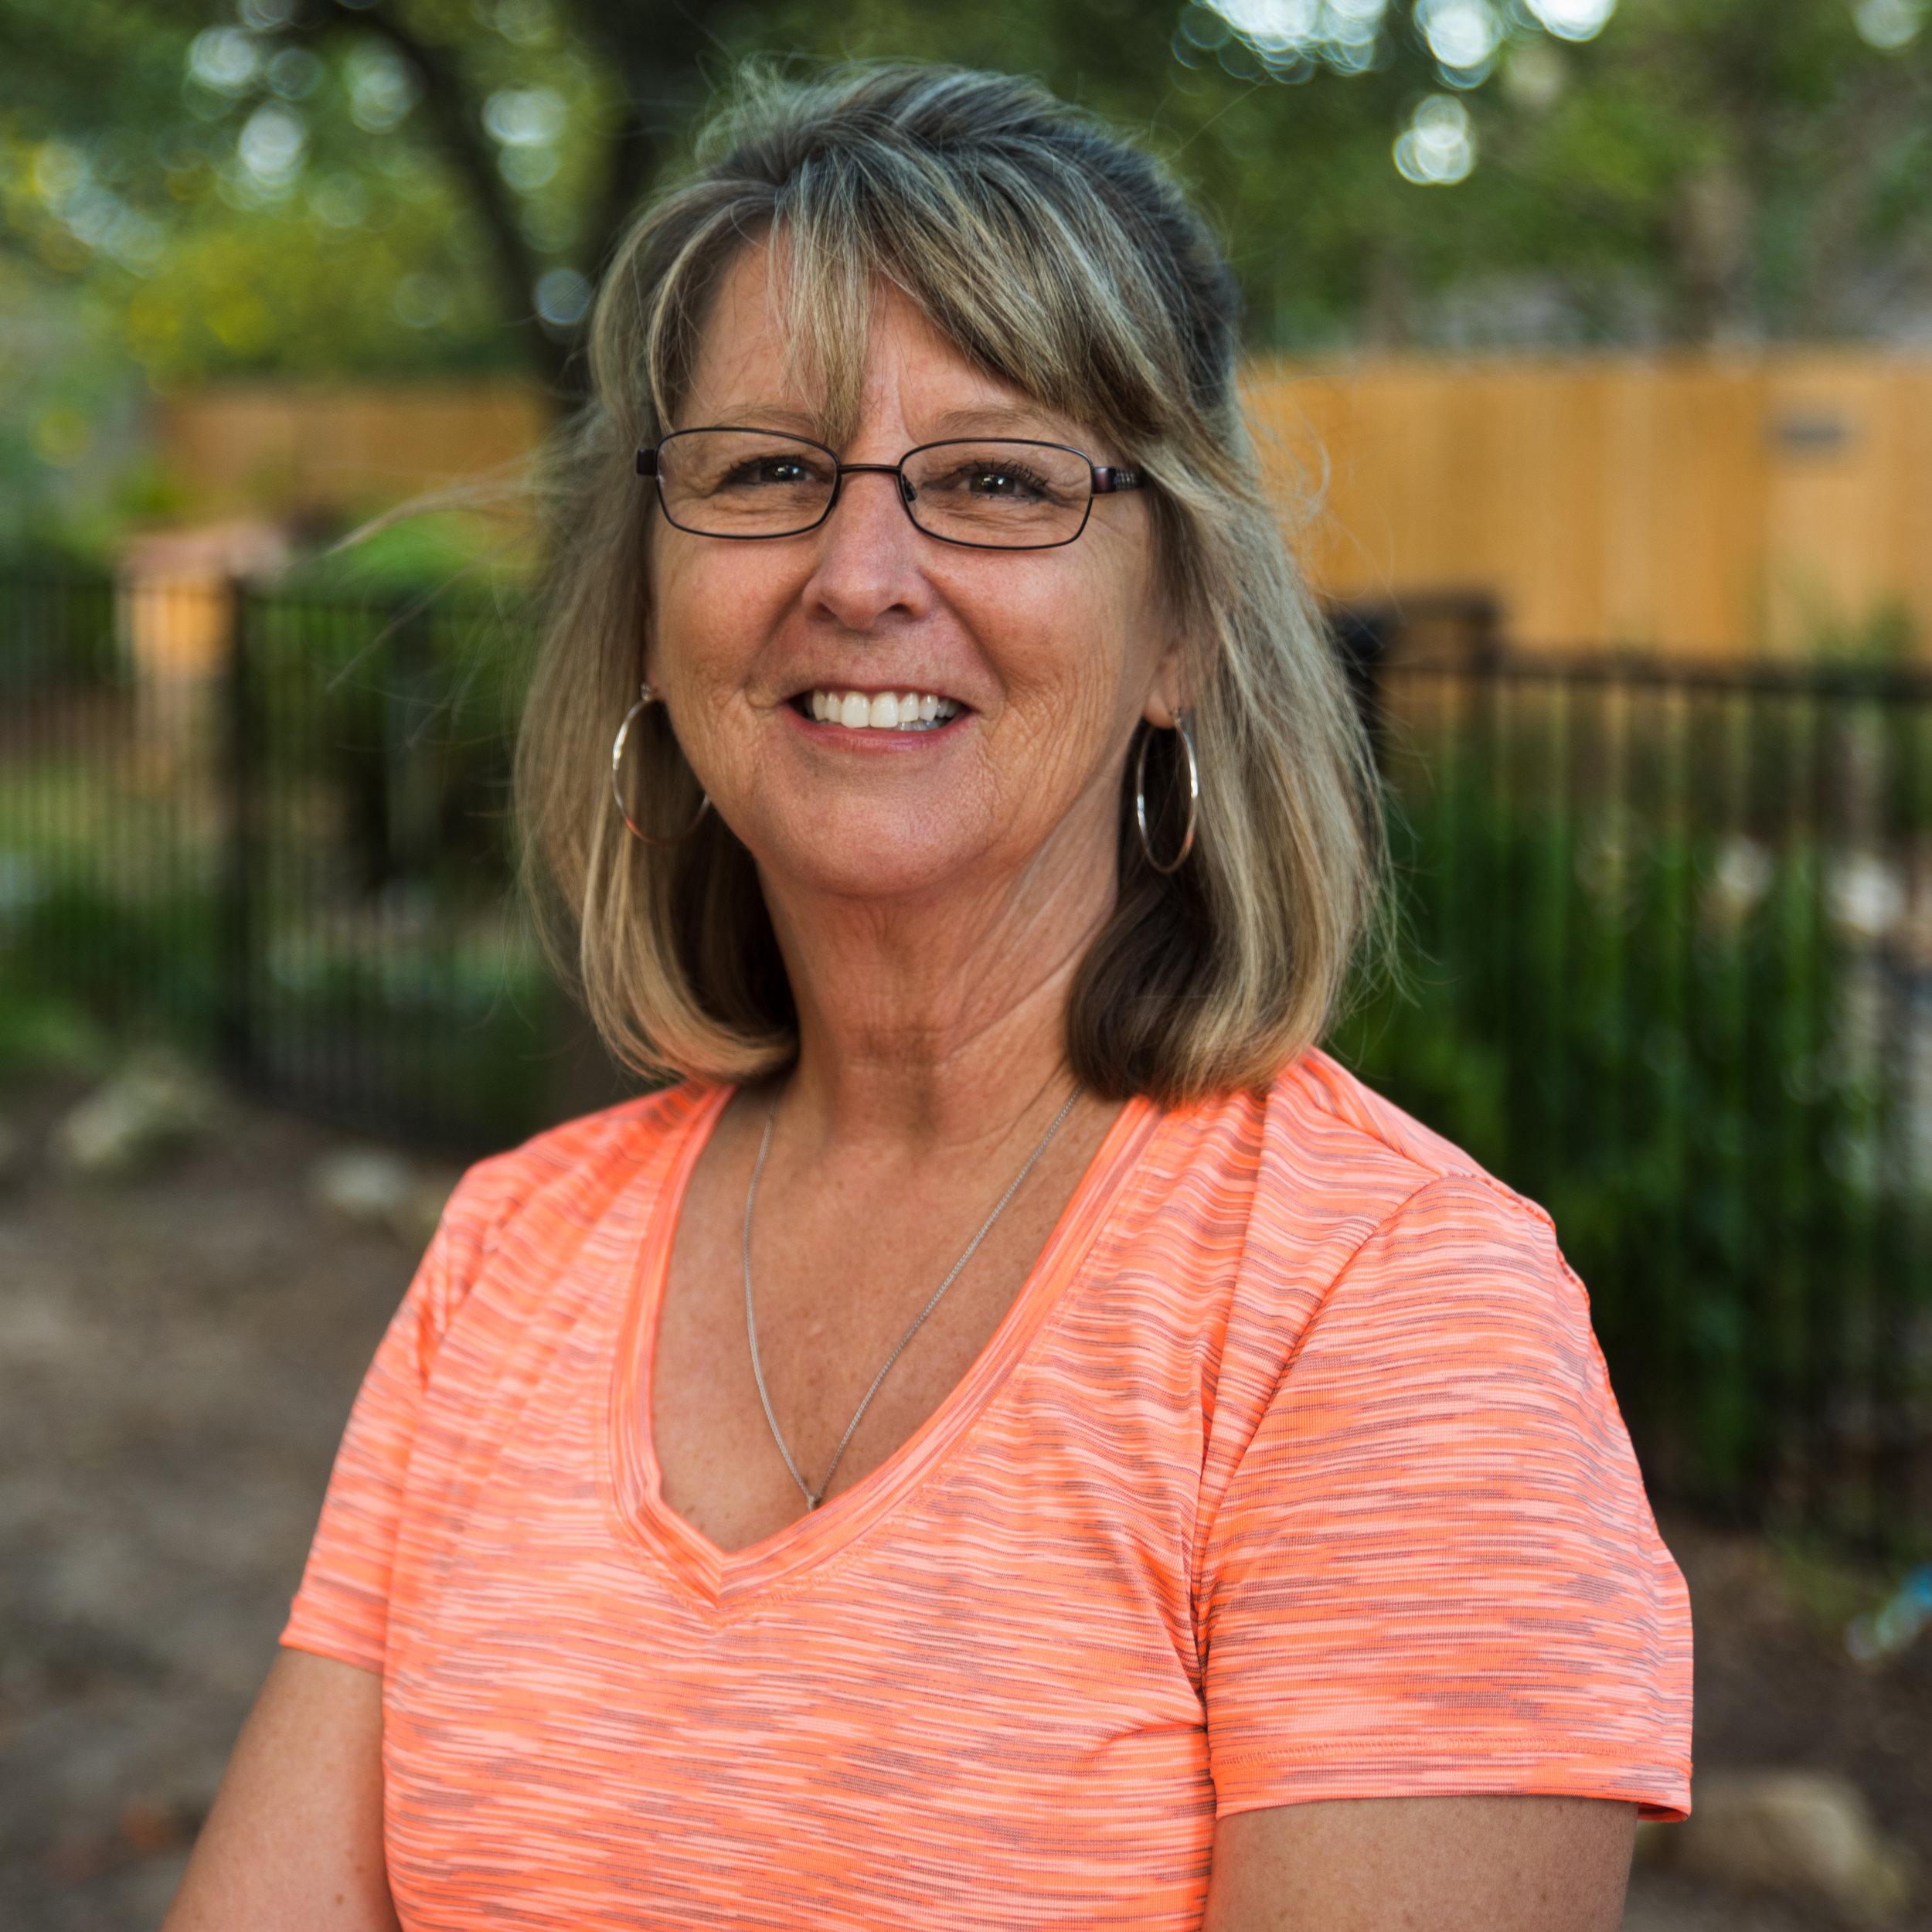 Brenda Niles - teaches 4K